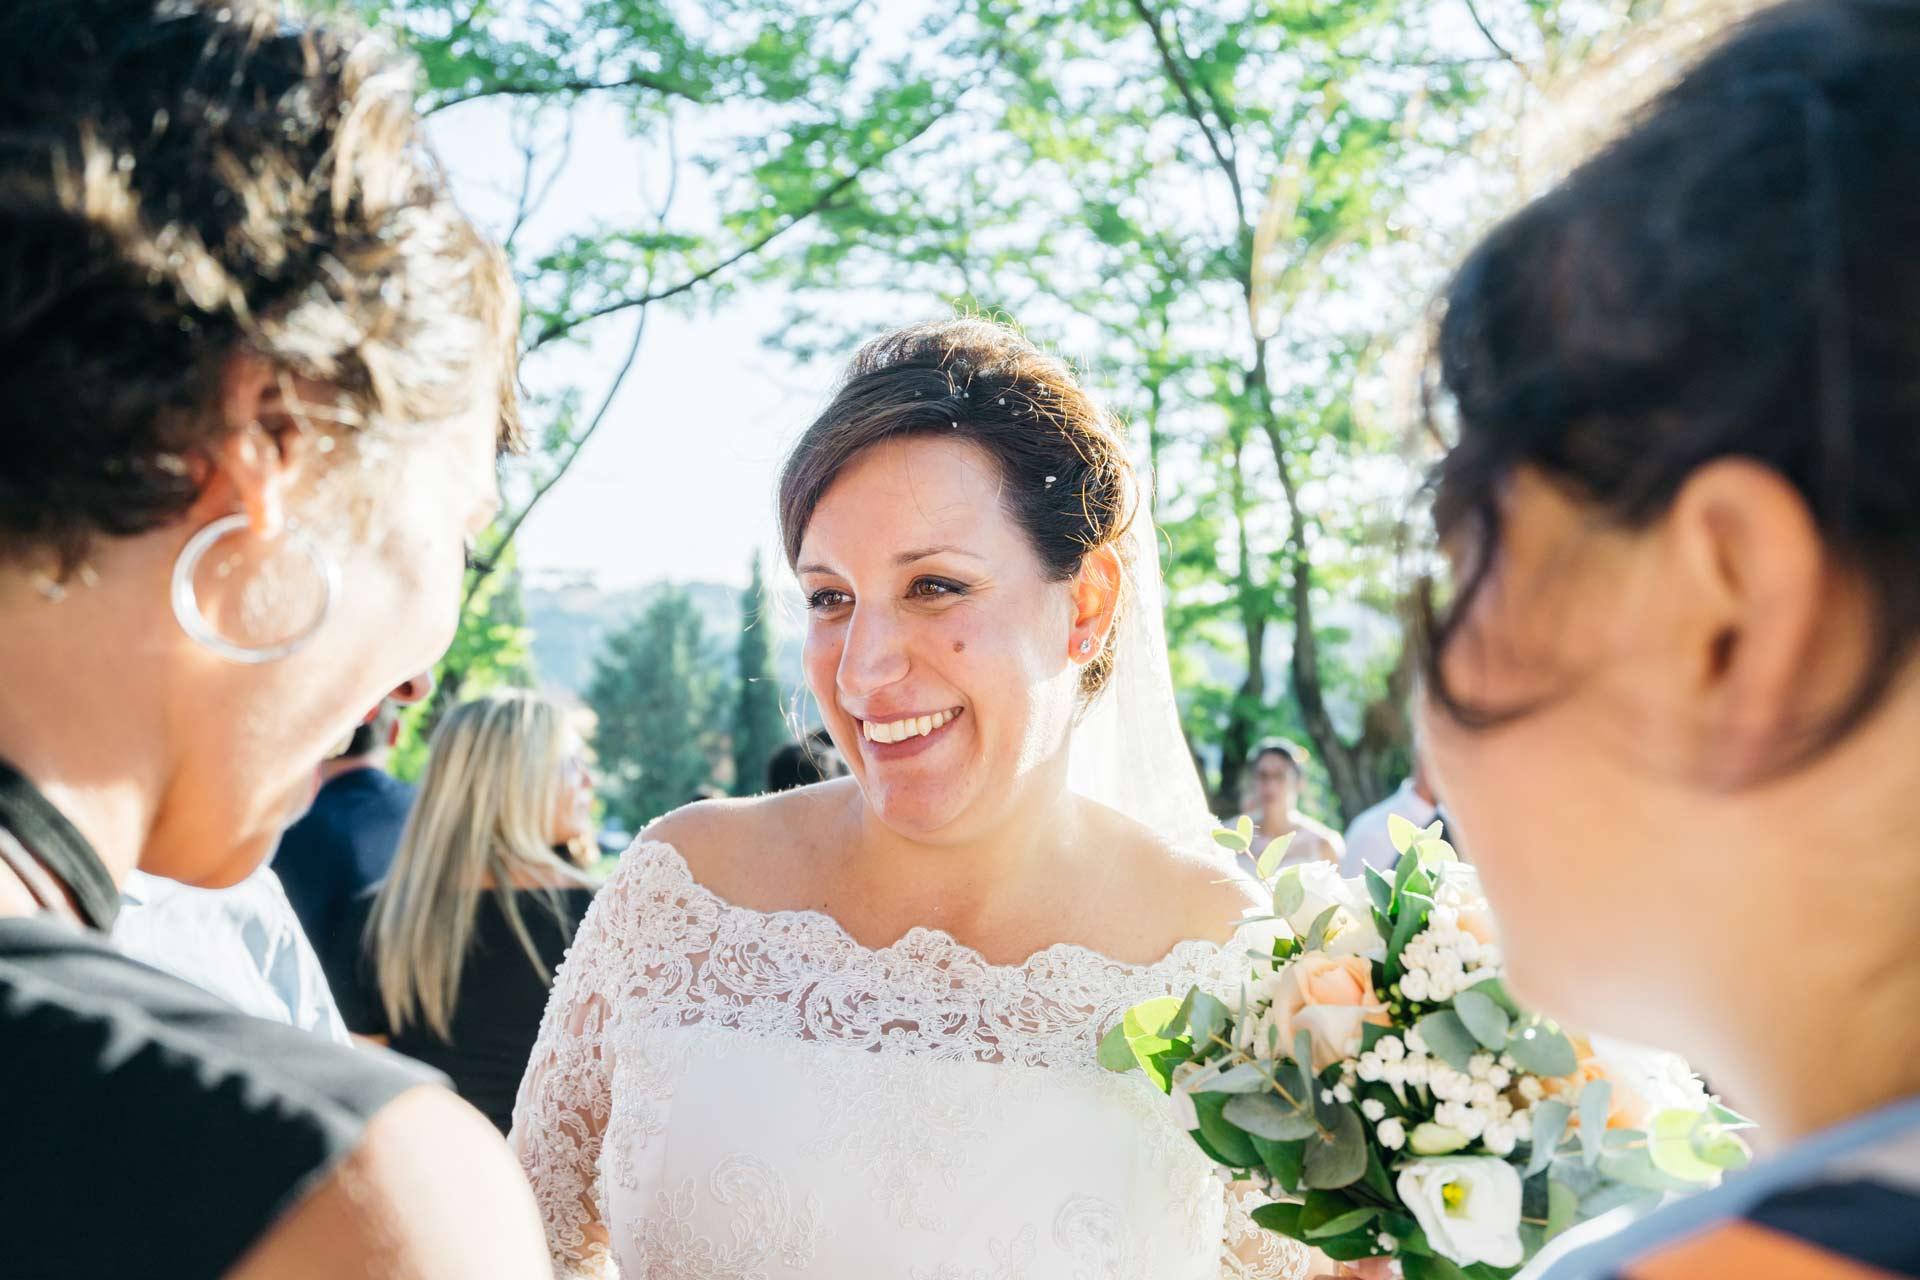 fotografo-matrimonio-roma-s&g4-simone-nunzi